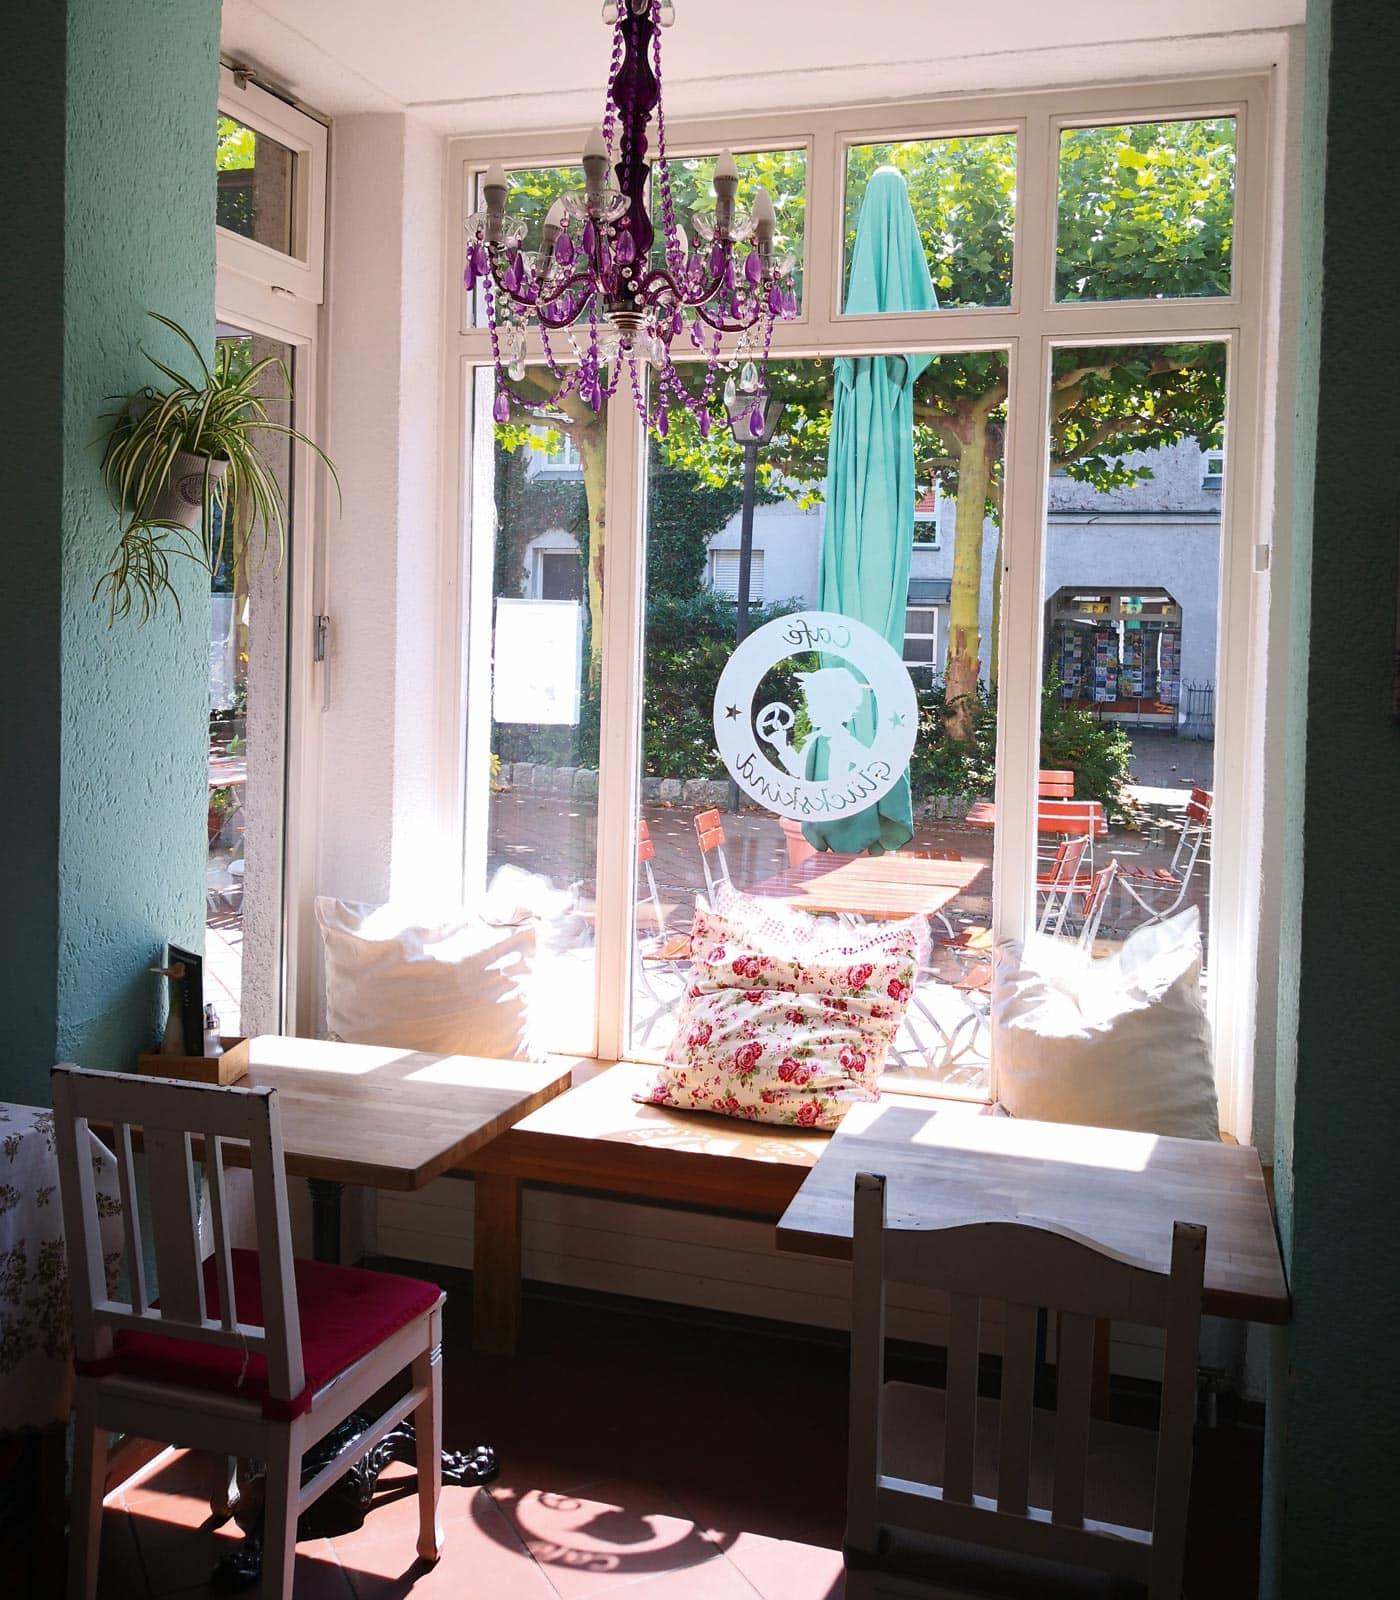 Kinderfreundliche Cafés in München: Café Glückskind // HIMBEER